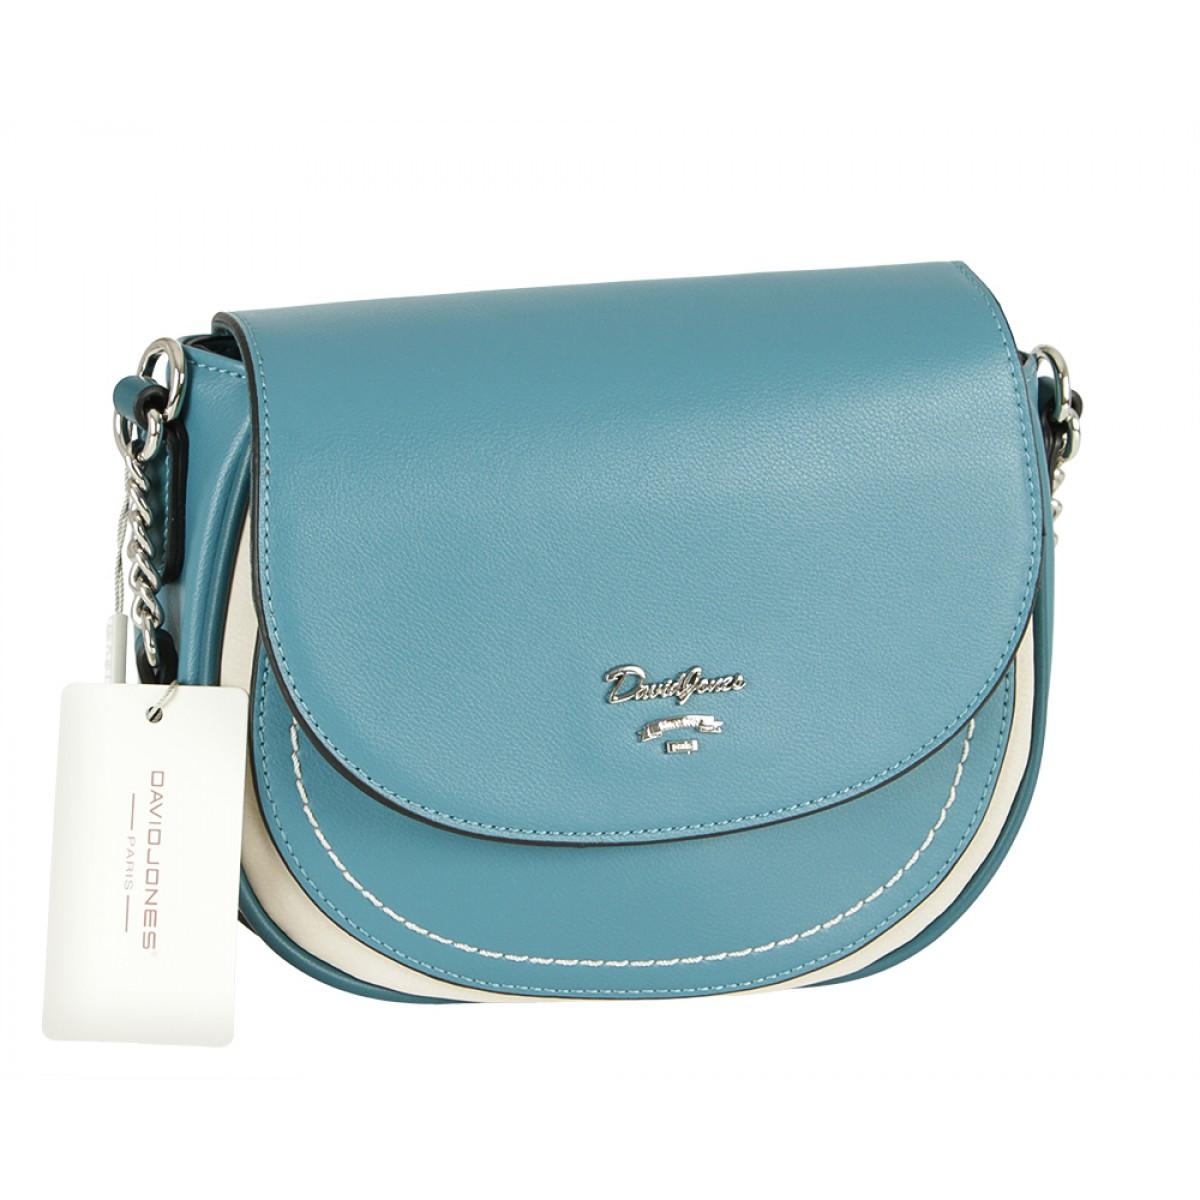 Жіноча сумка David Jones 6204-2 PEACOCK BLUE